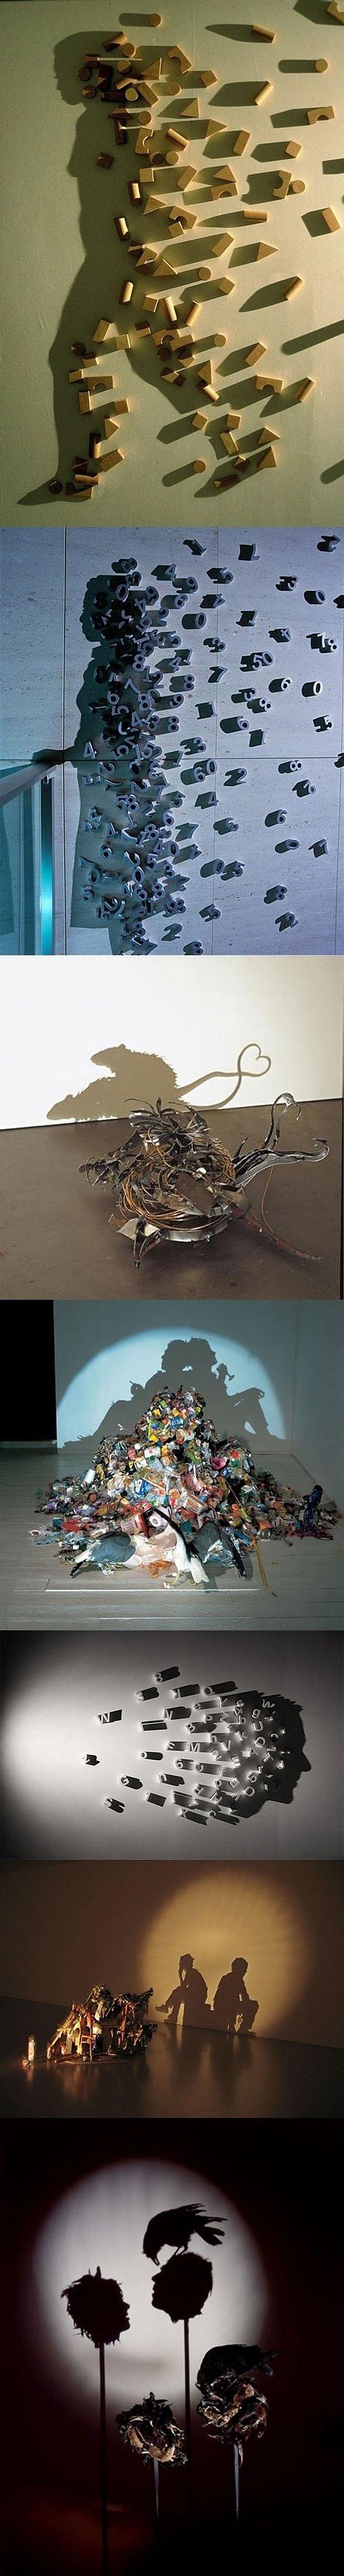 Mindblowing Shadow Art Geeky Things Pinterest Shadow Art - 20 incredible examples of shadow art